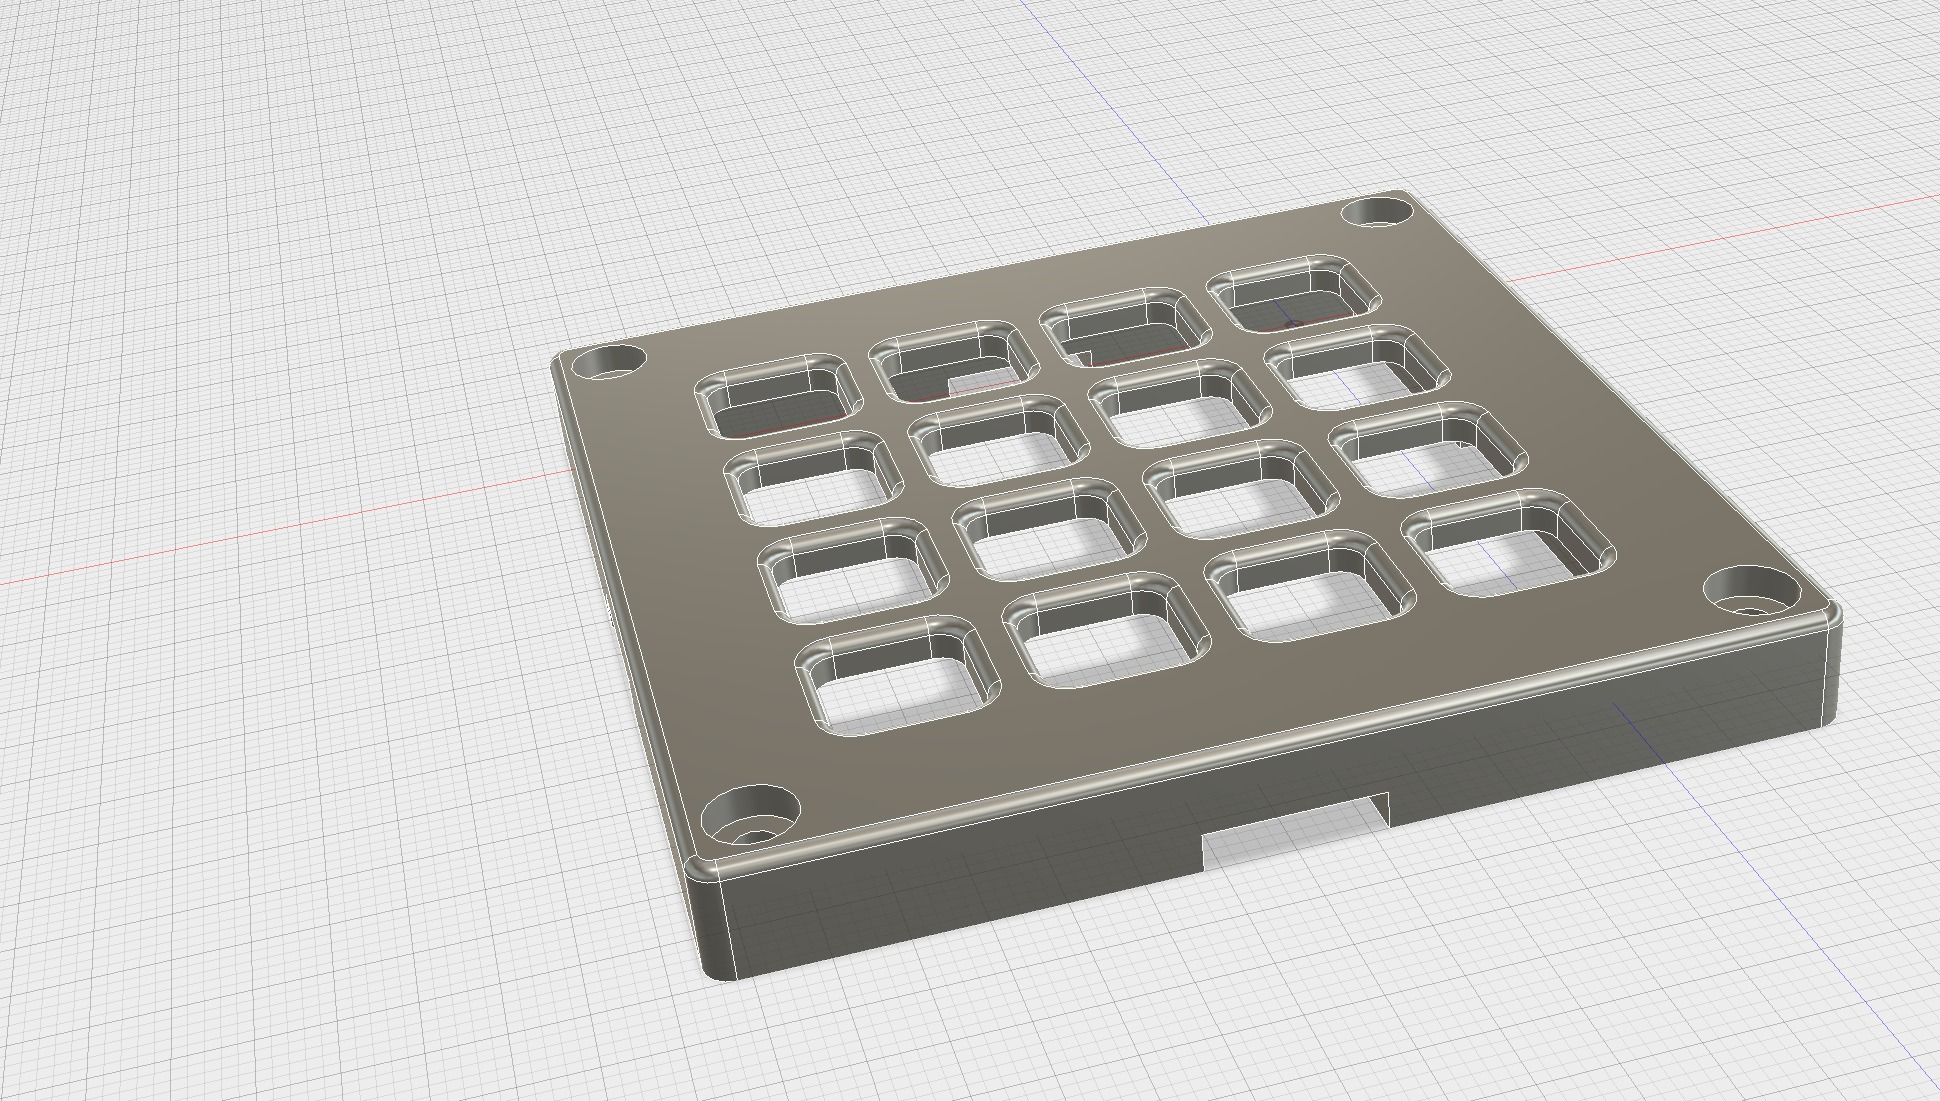 Bezel For Adafruit Trellis 4x4 keypad|Autodesk Online Gallery